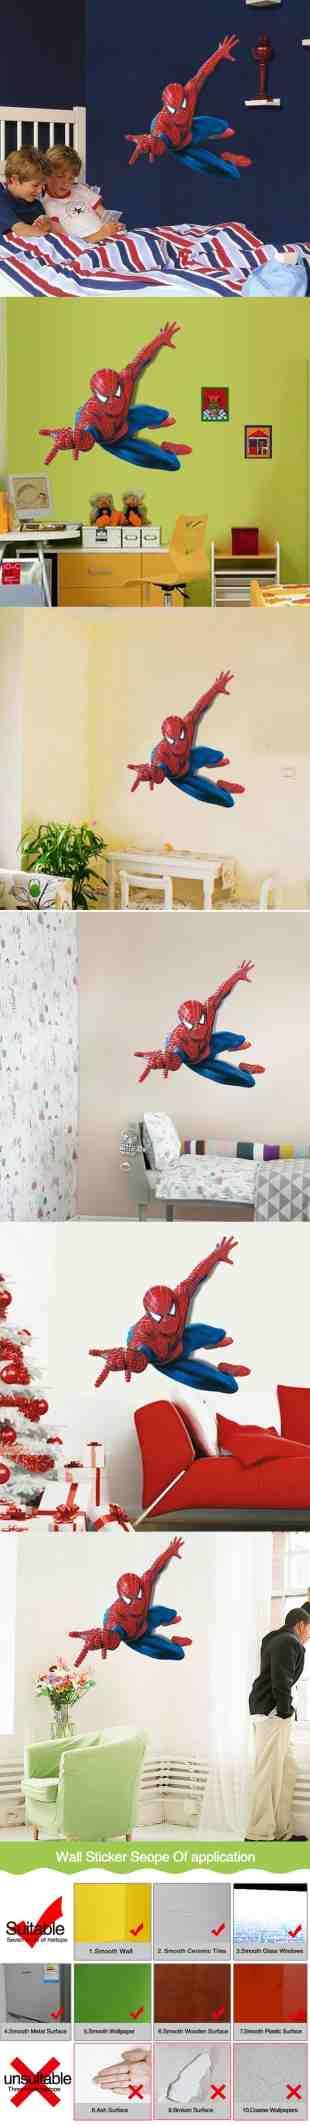 Cartoon Spiderman Wall Decal Marvel Wall Poster Vinyl Superhero Wall Art Sticker For Kids Room Boys Room Decor Marvel Spider Man Wallpaper Cheap Wall Art Decals Cheap Wall Art Stickers From Jy9146